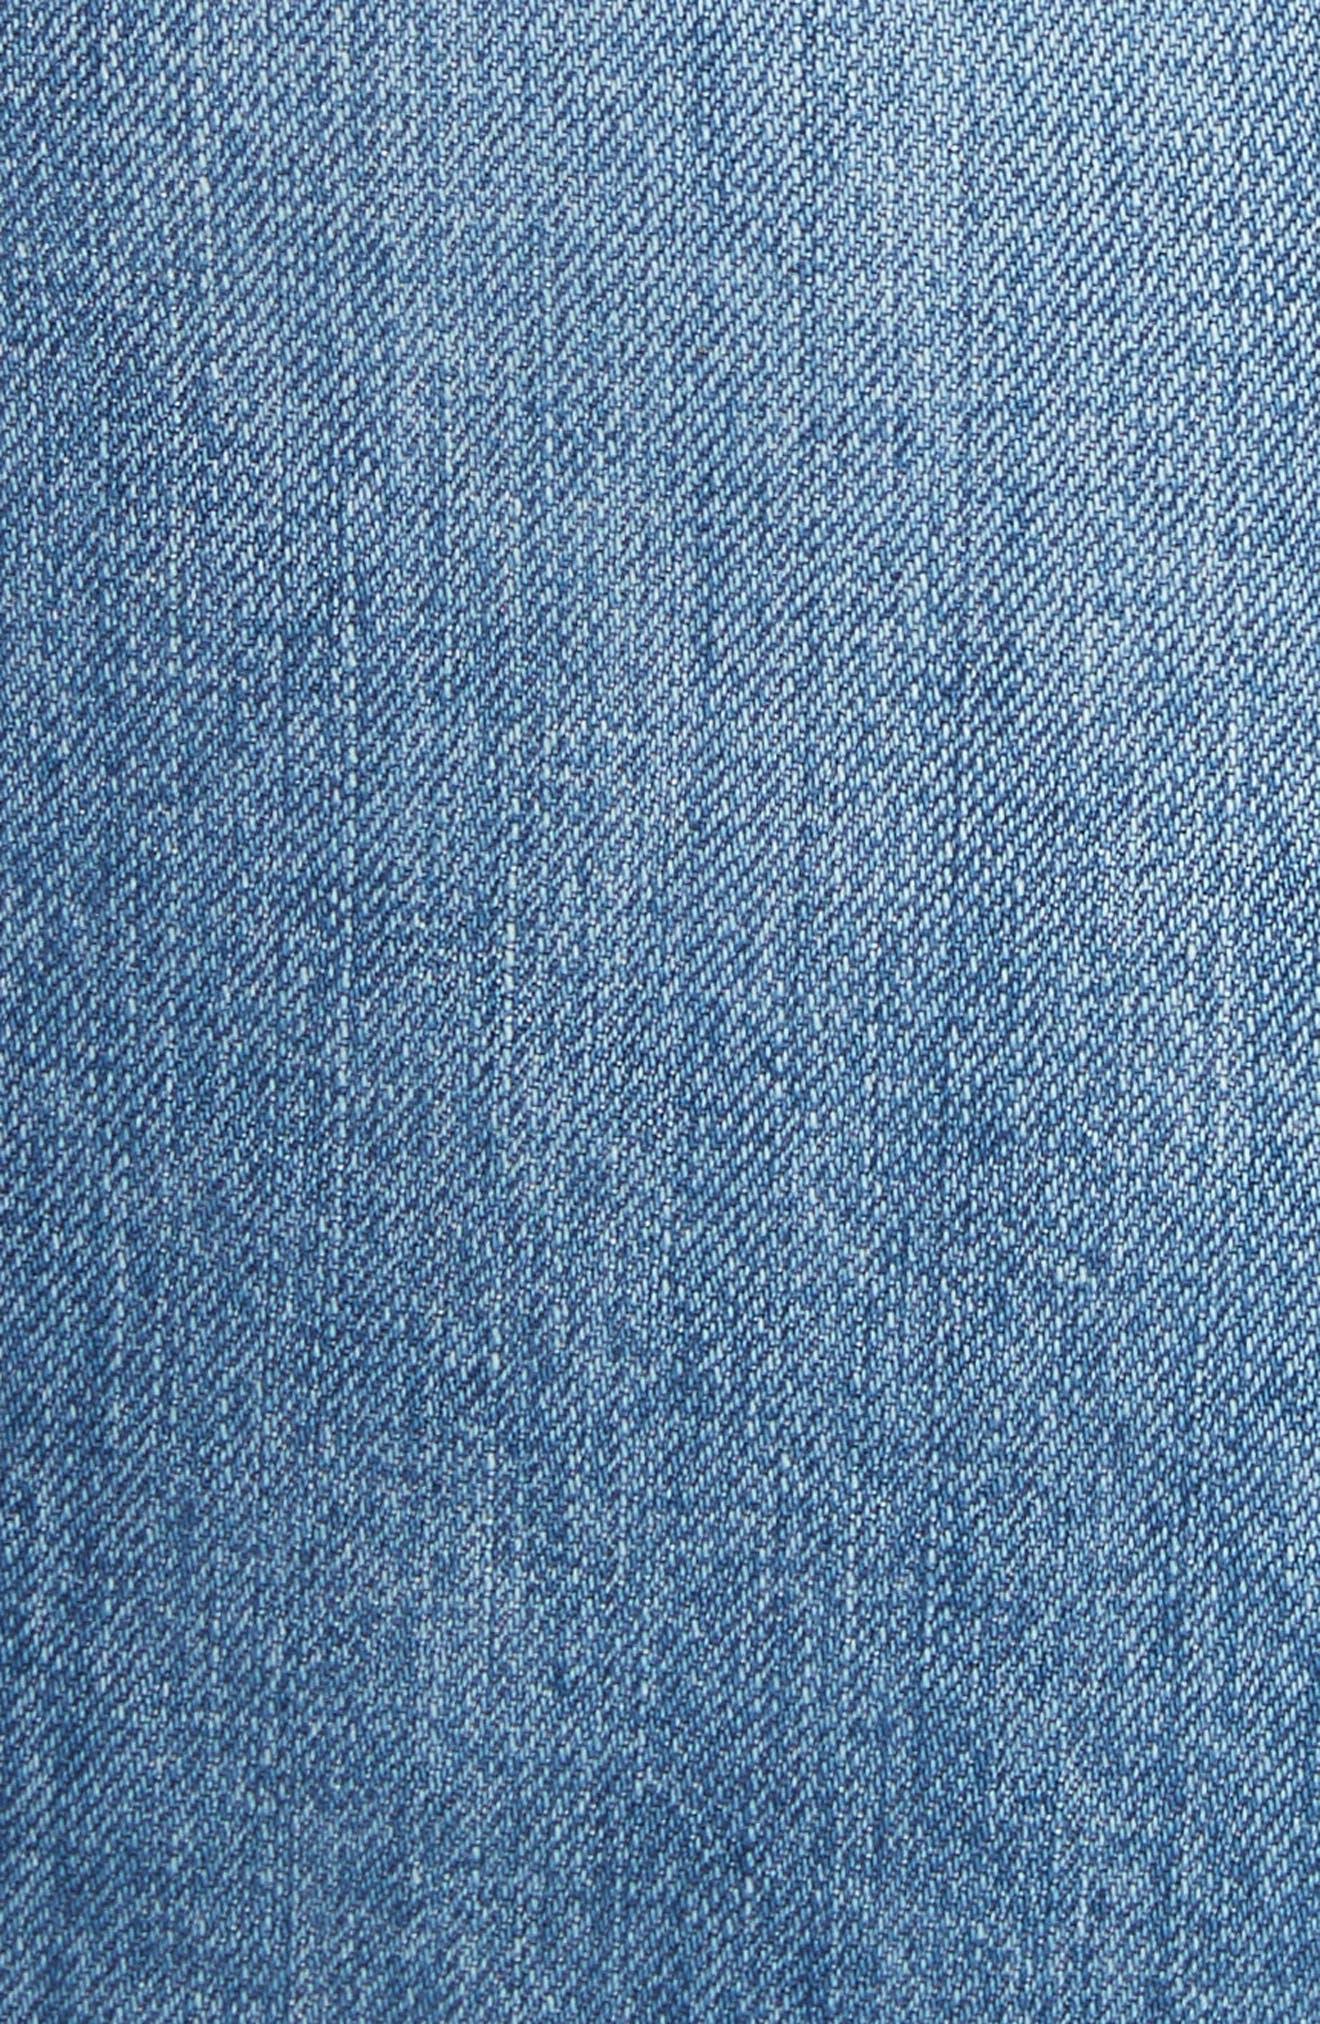 Alternate Image 5  - rag & bone/JEAN Moss High Waist Denim Miniskirt (Clean Levee)